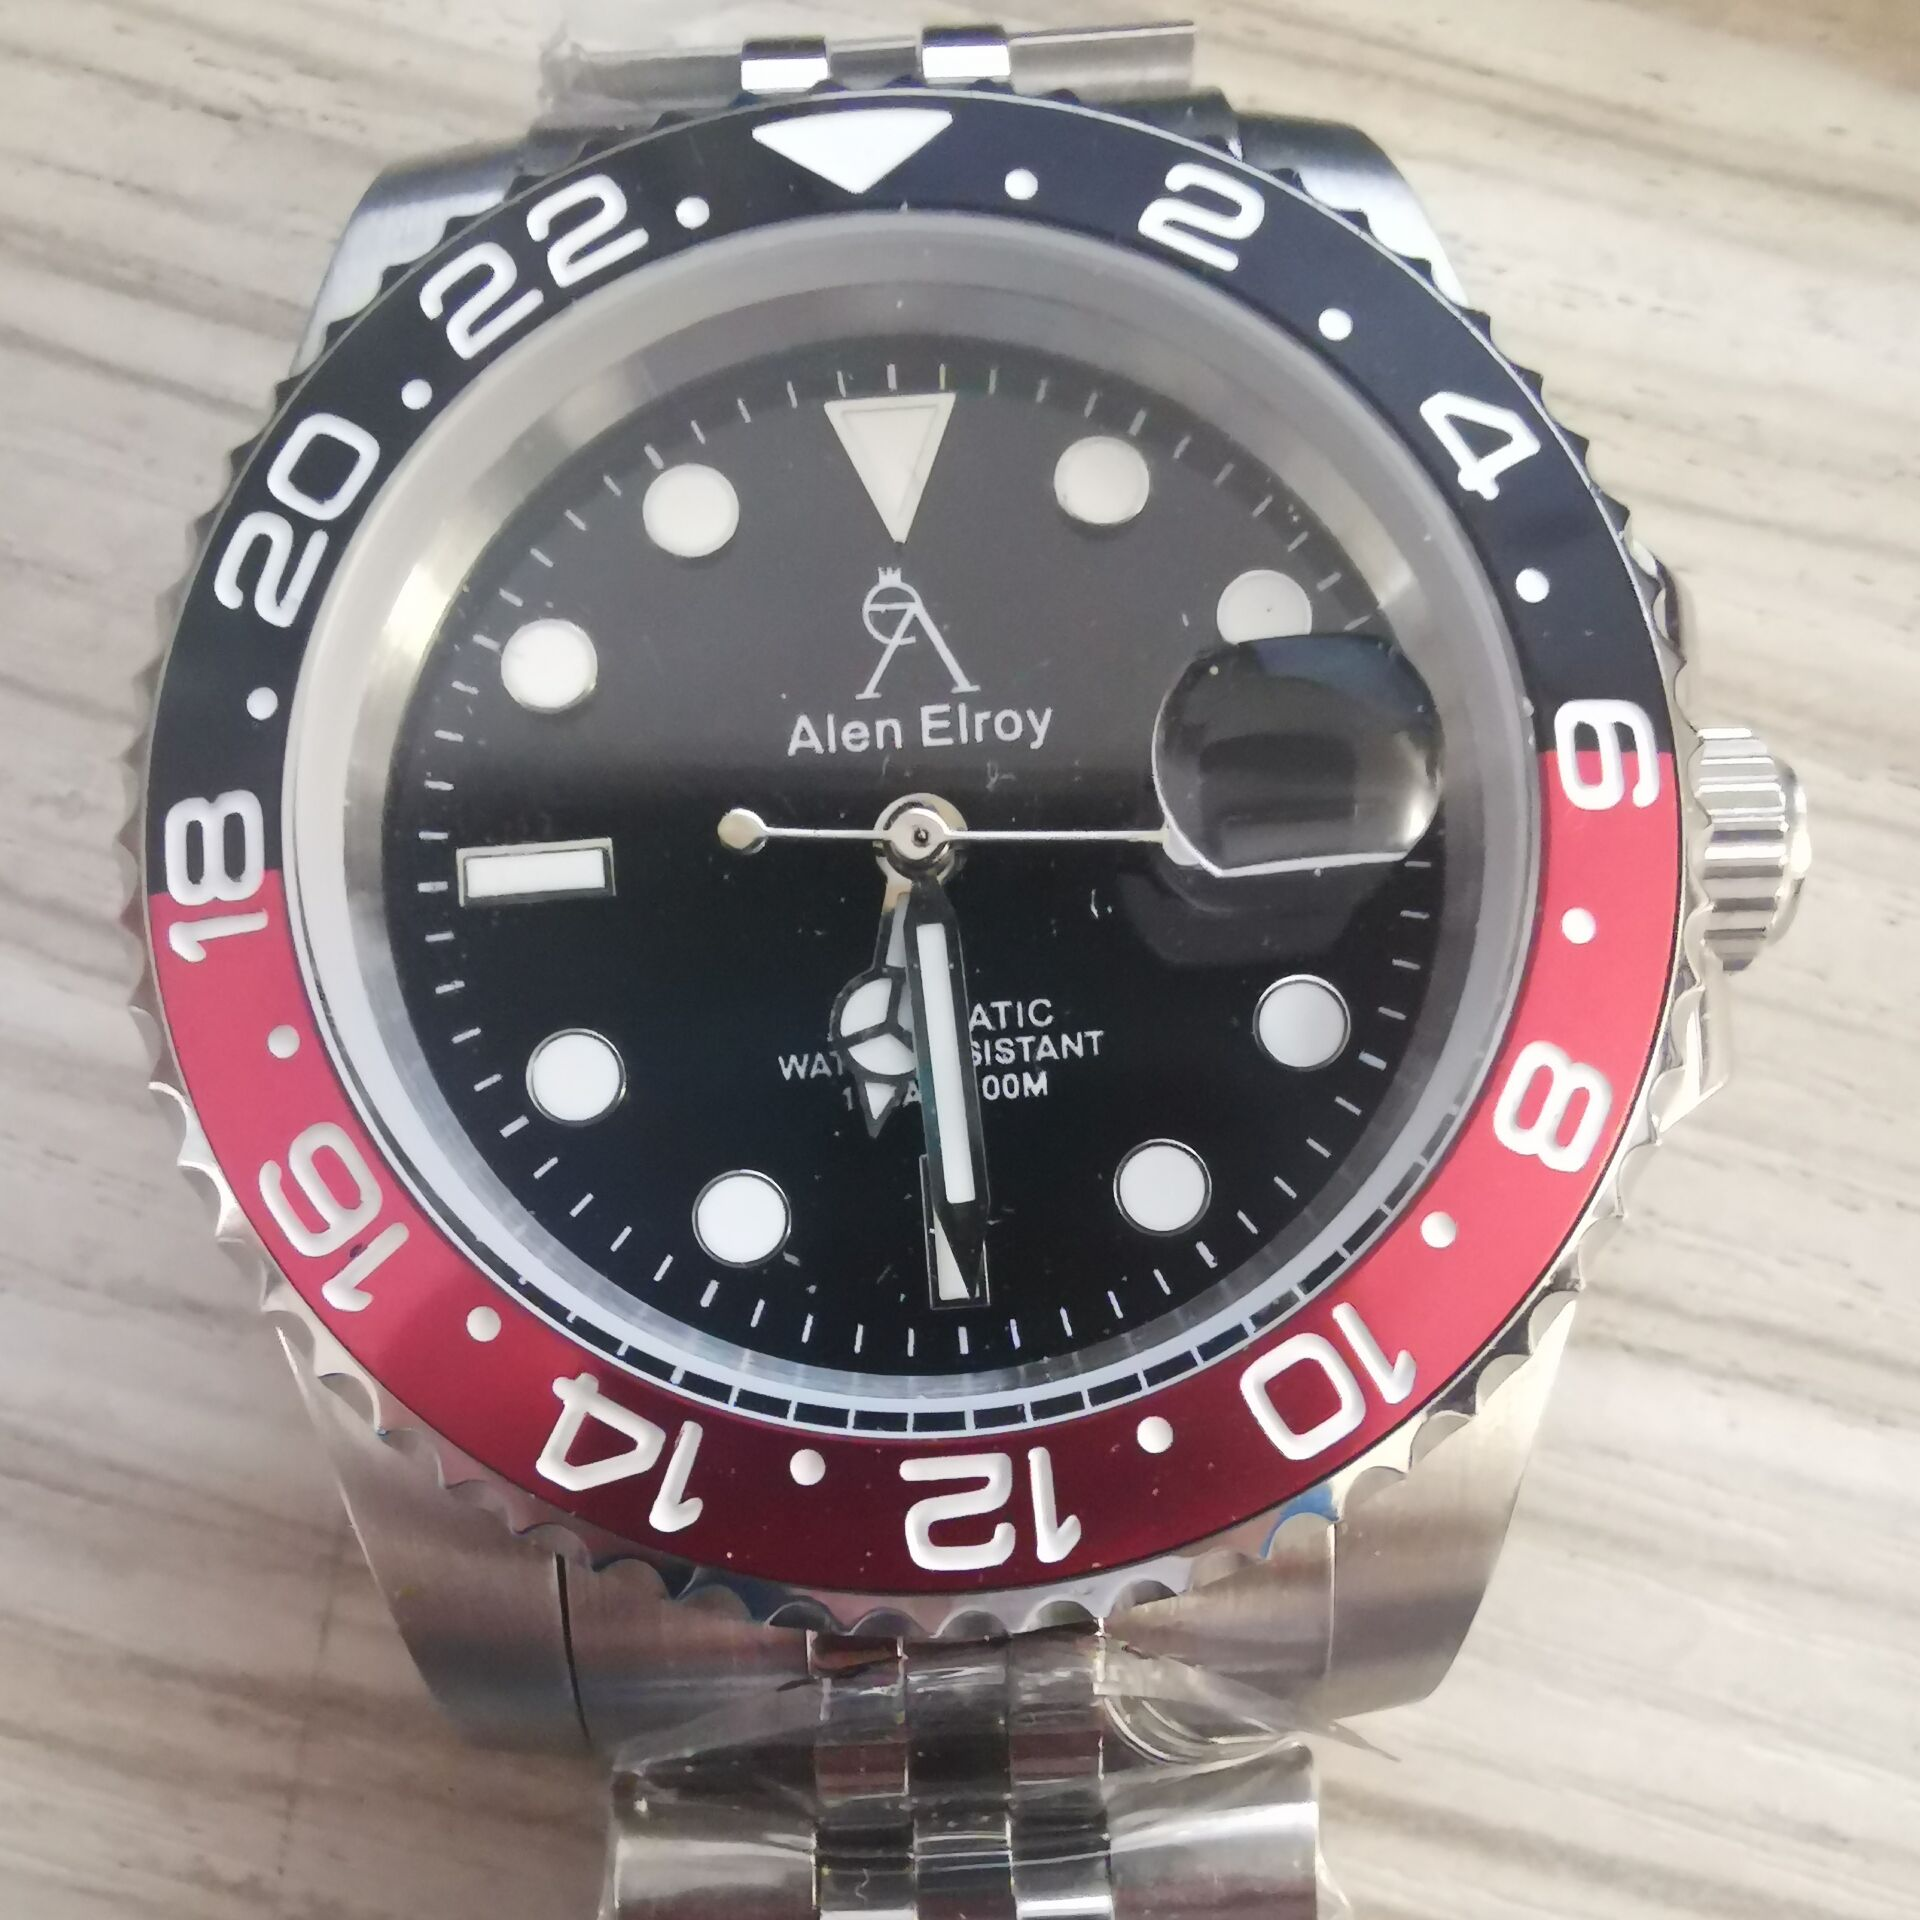 AE High-end watches men's automatic U1 factory ceramic bezel sapphire glass luminous needle sweep movement luxury Black sub 01